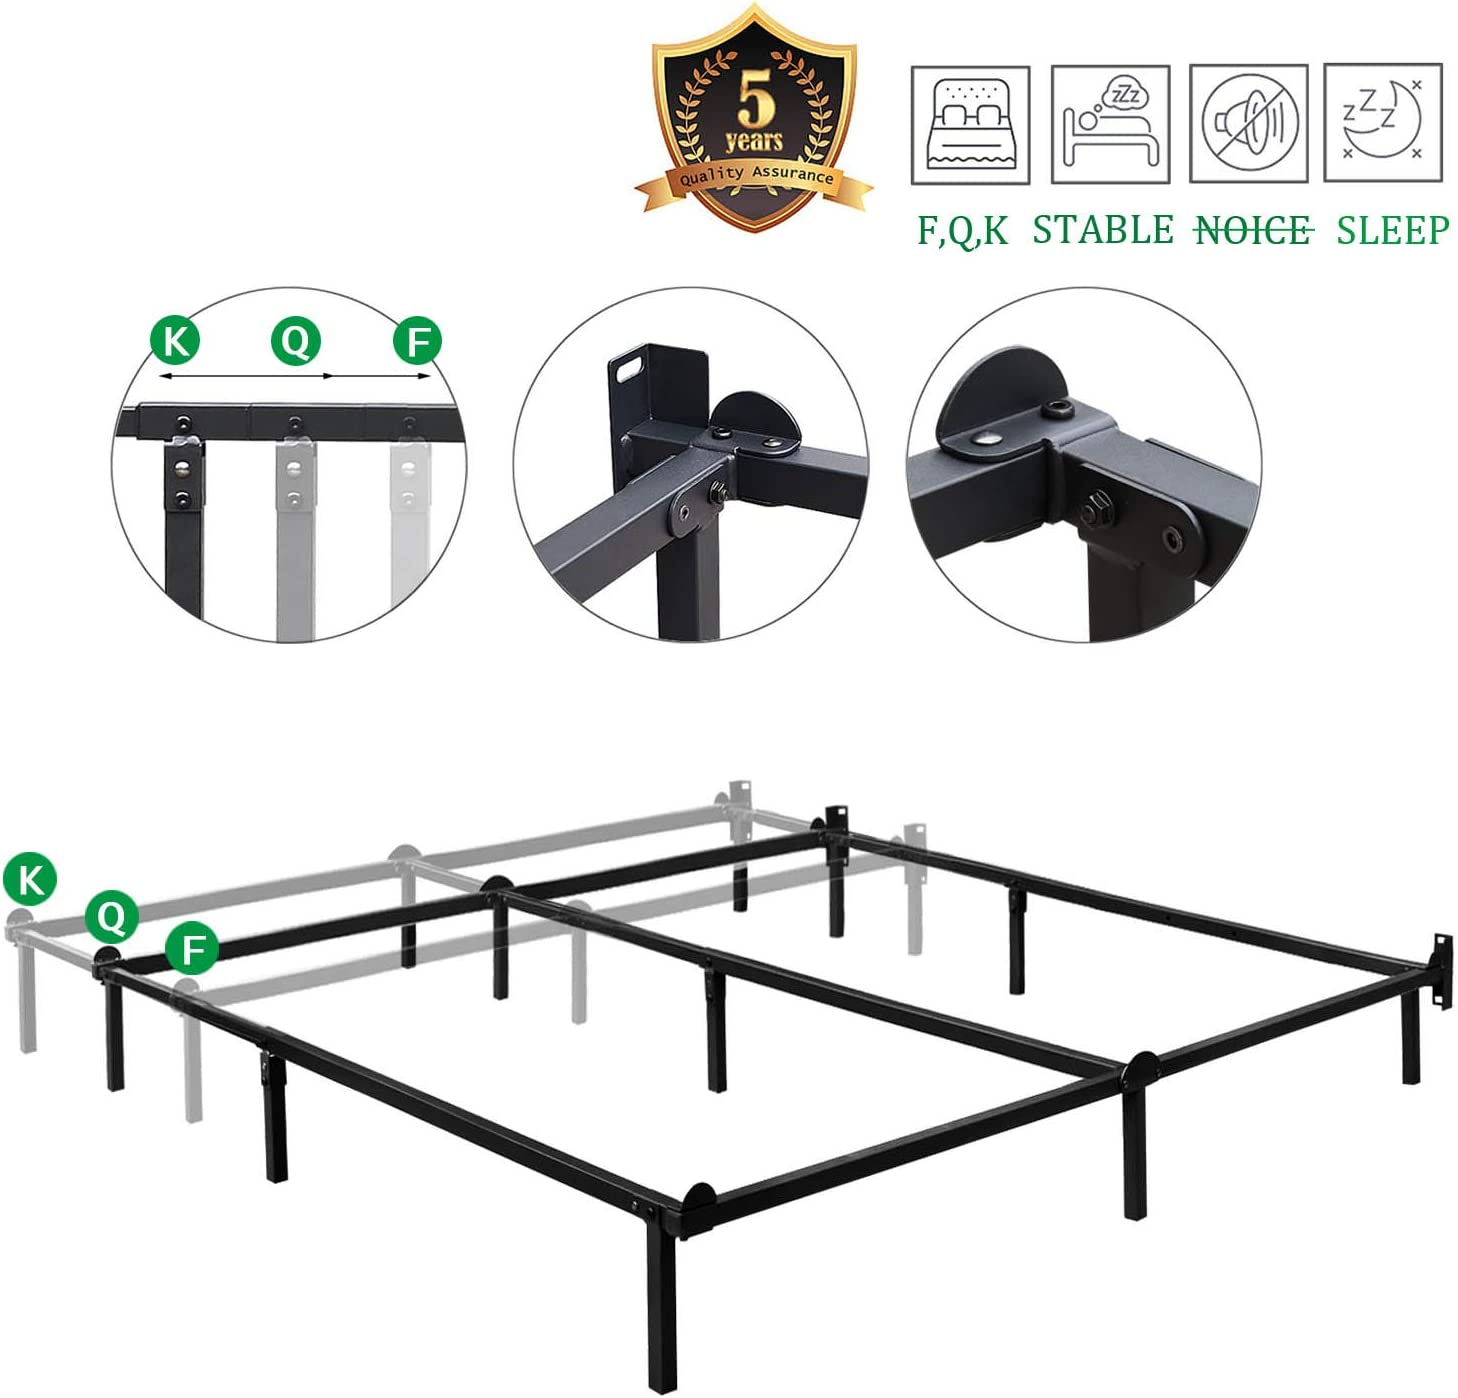 HAAGEEP Queen Size Bed Frame for Box Spring and Mattress Set Adjustable Full Beds King Frames Metal Bedframe Support